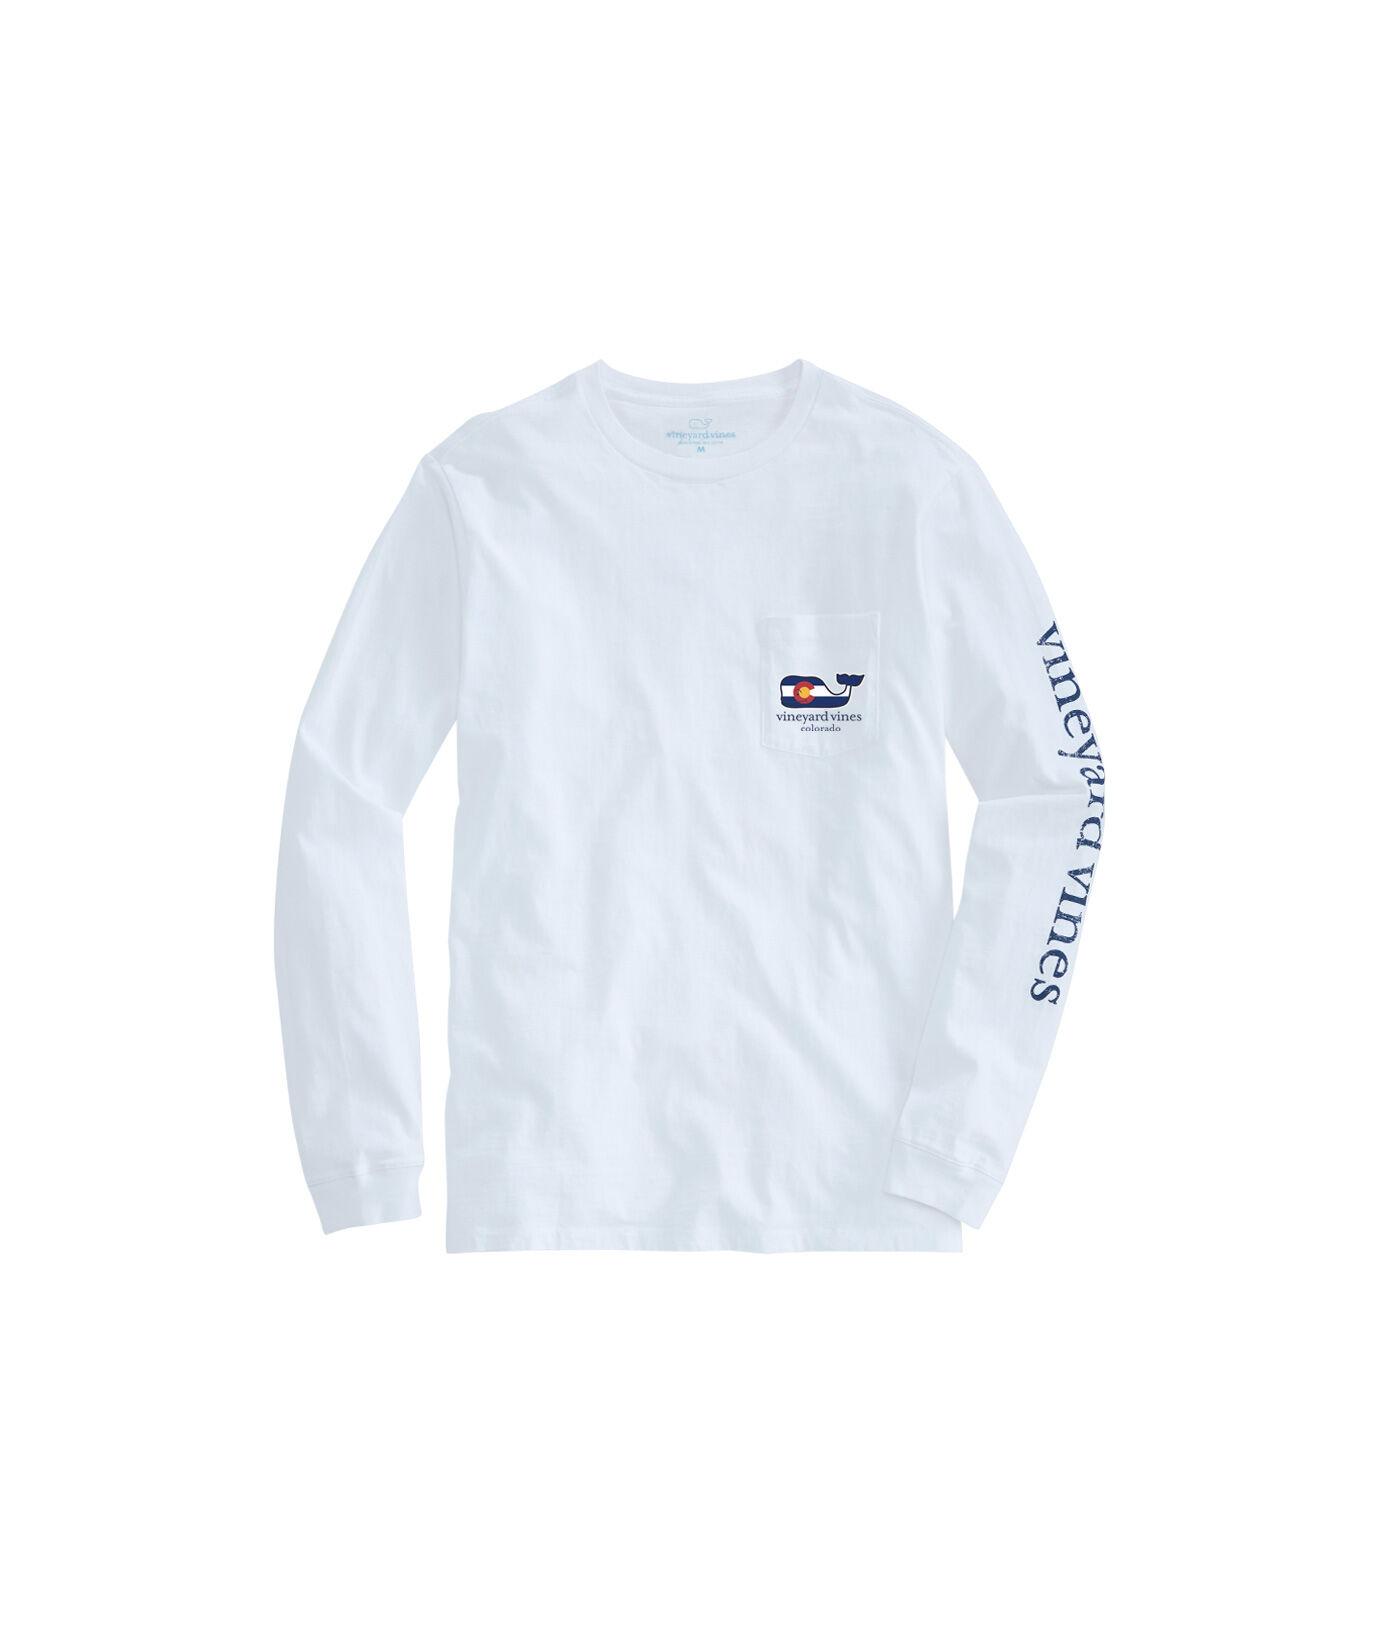 Colorado USA Adult Cotton Long Sleeve T-shirt